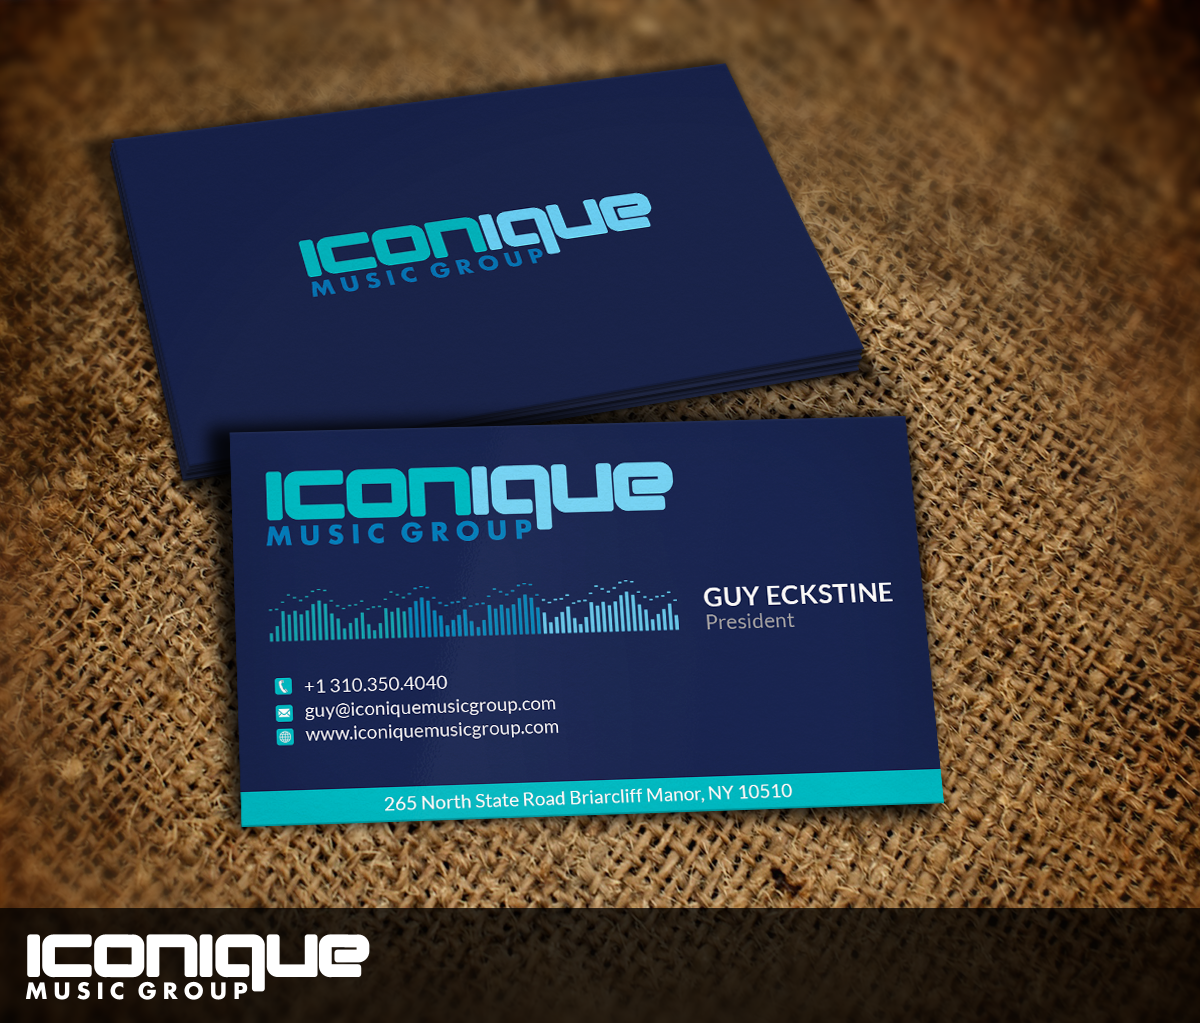 Management Business Card Design for Iconique Music Group by Nelsur ...